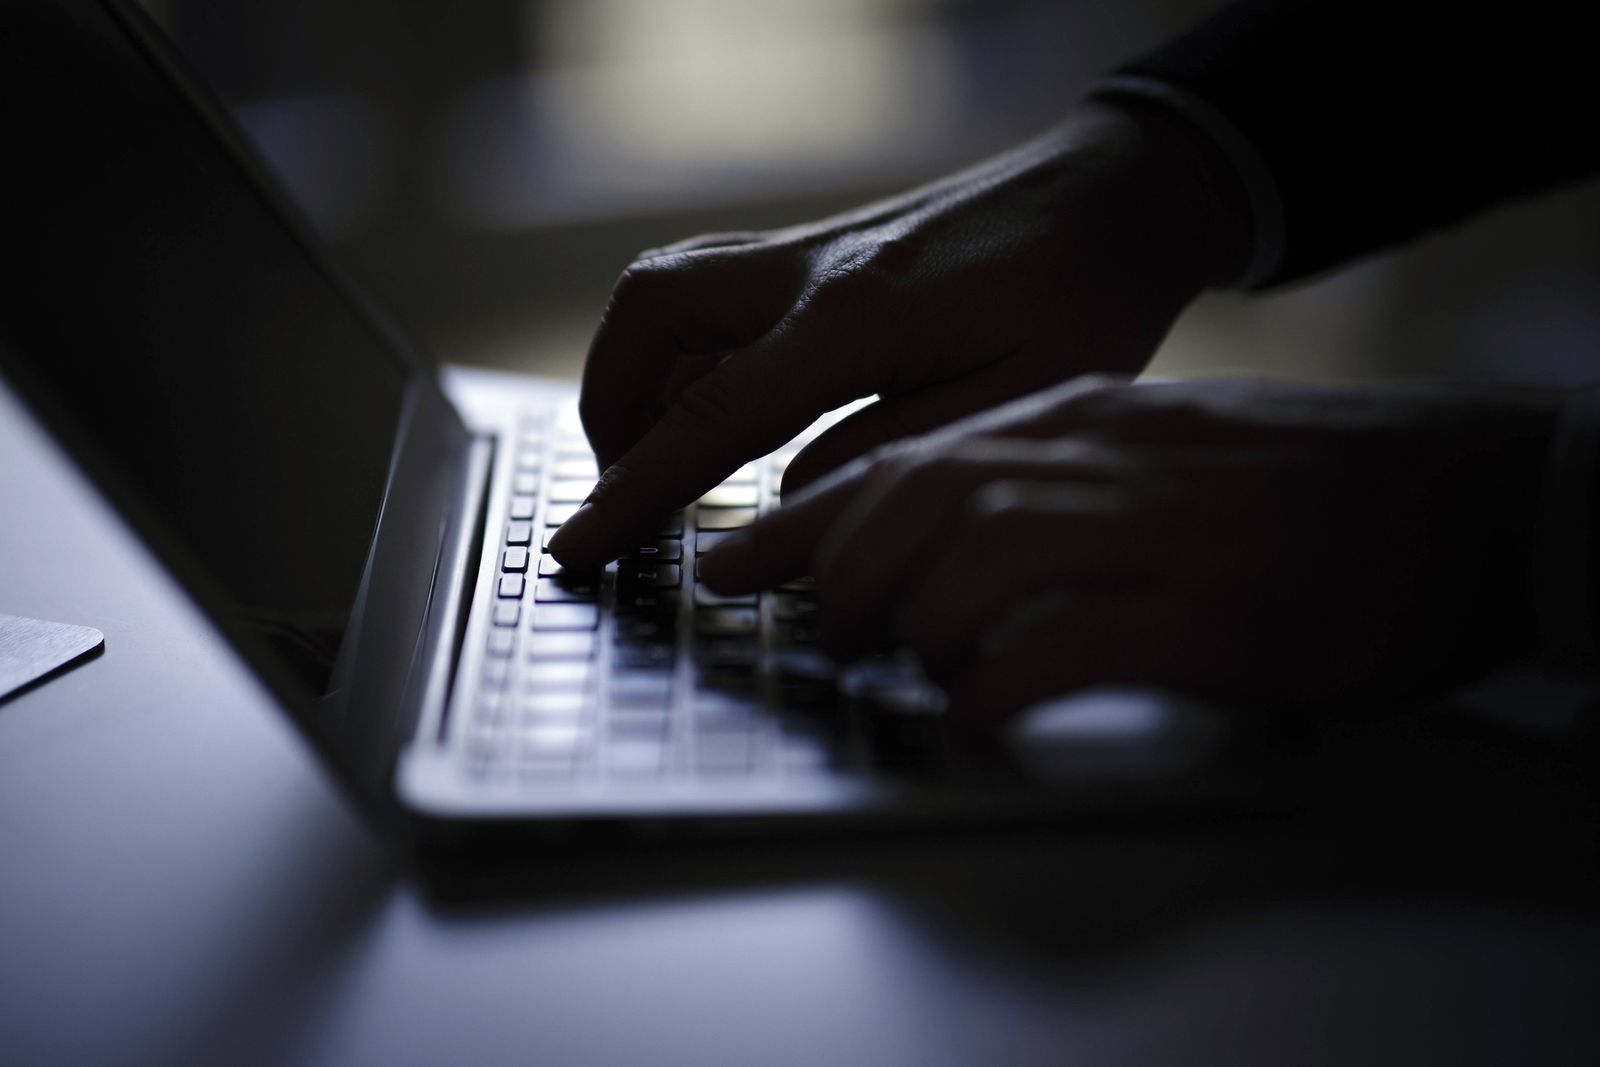 EINMALIGE VERWENDUNG Cyber/ Computer/ Hacker/ Angriff/ Datenklau